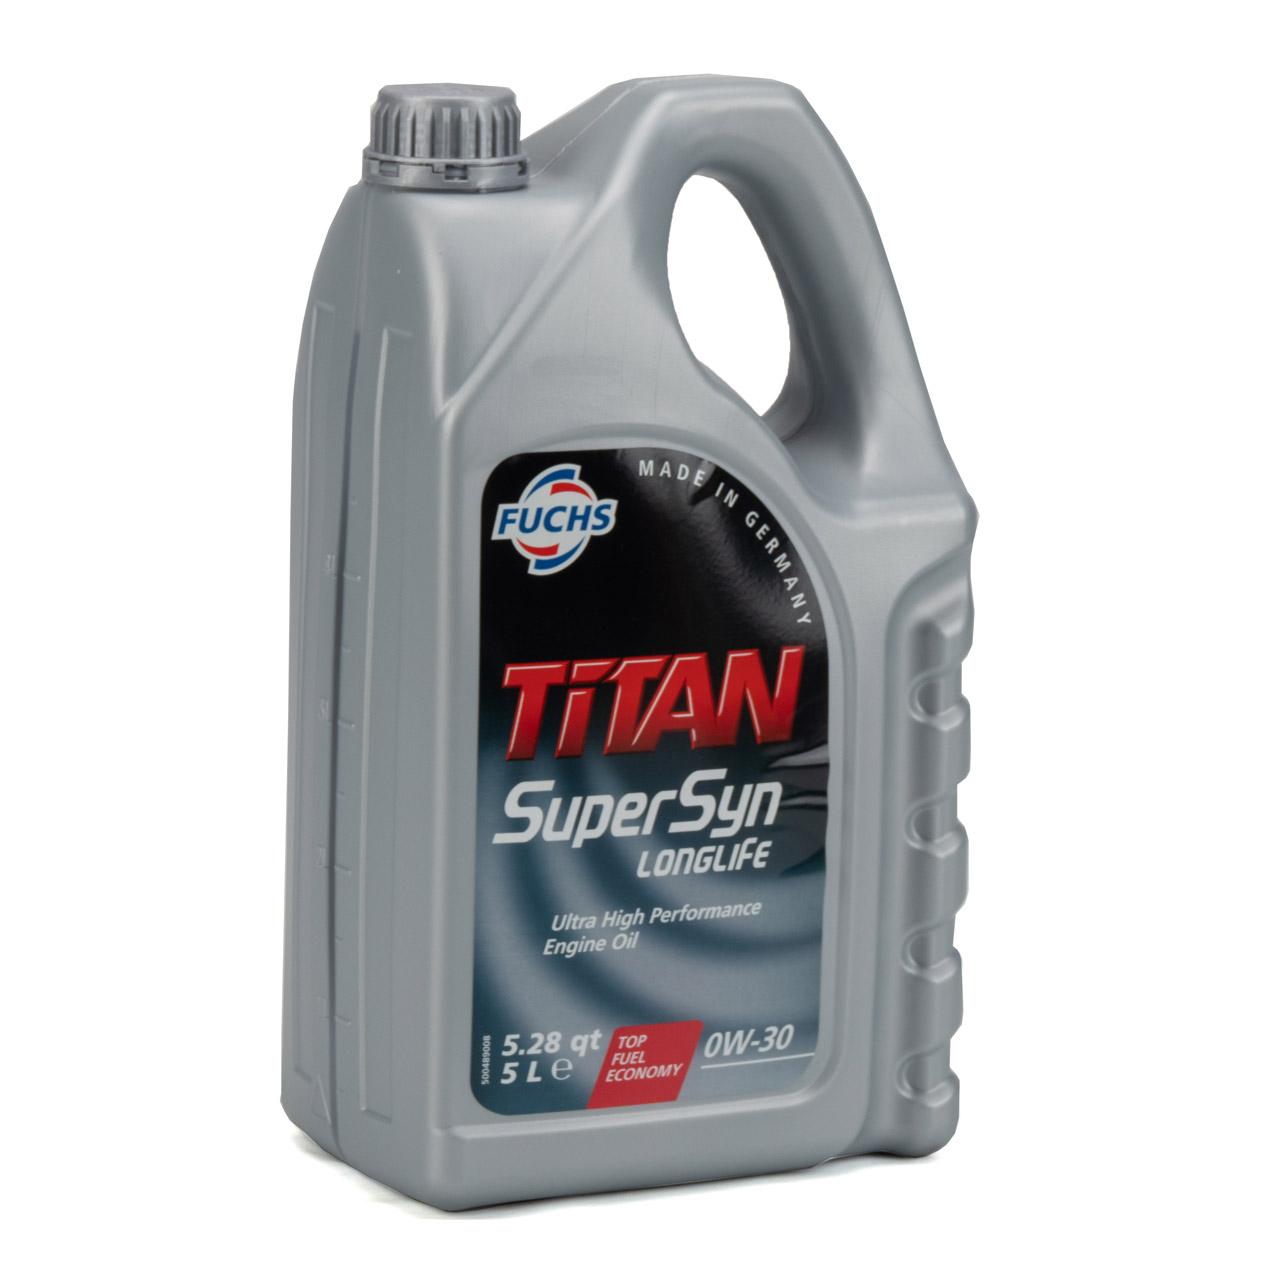 FUCHS Motoröl ÖL TITAN SUPERSYN LONGLIFE 0W30 MB 229.5 VW 502/505.00 - 8 Liter